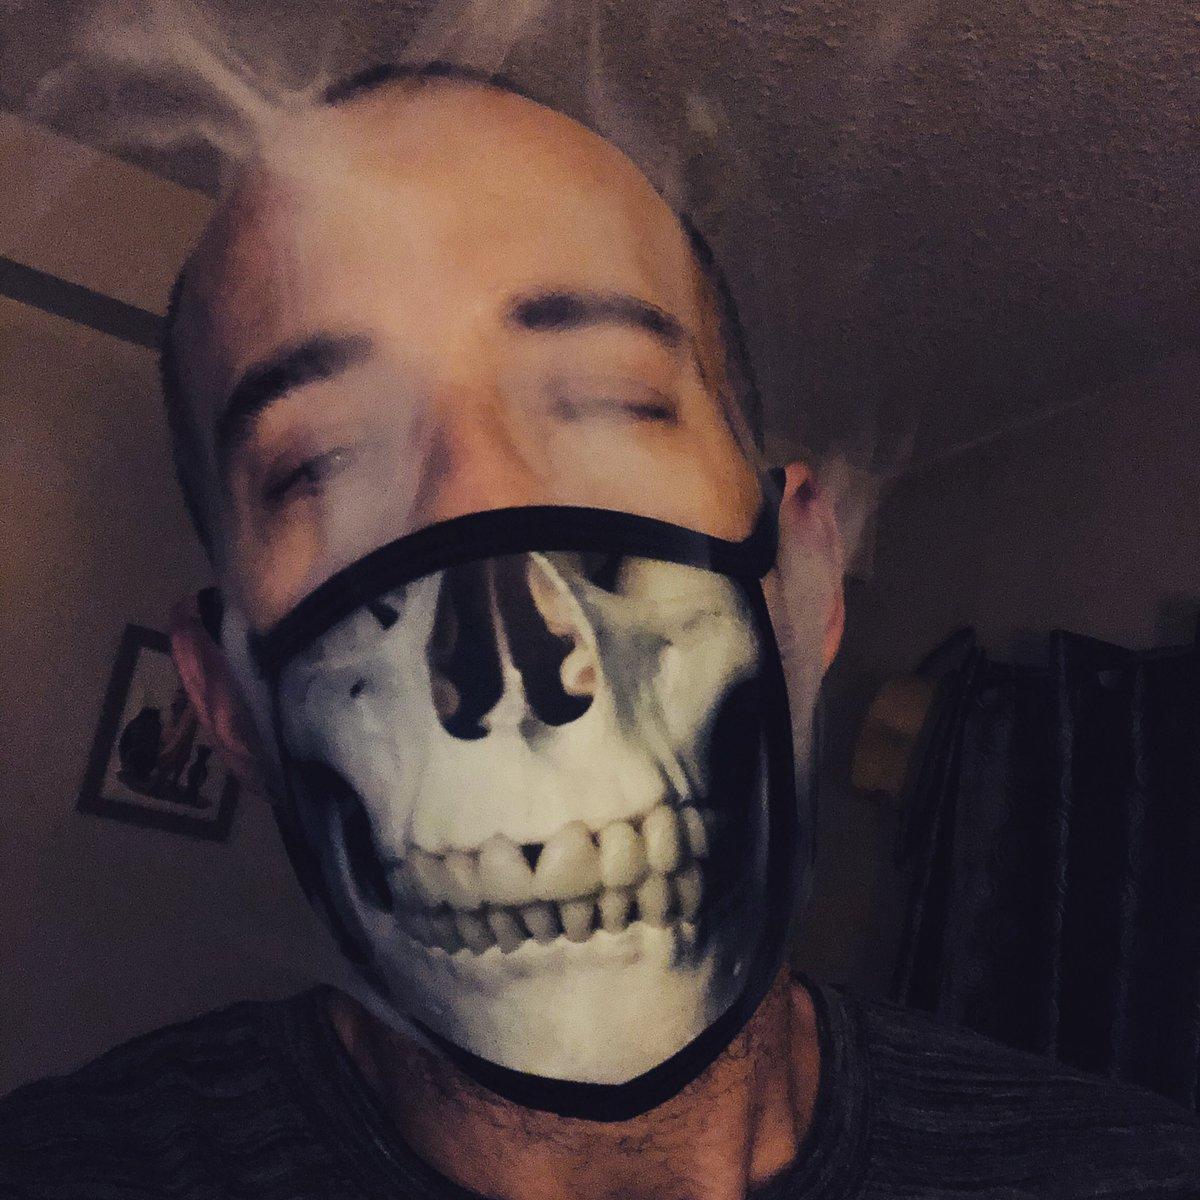 #HalloWeed #SkullGang #StonerFam #StayLifted 💨💚✌️ https://t.co/JLdt2KEx5B